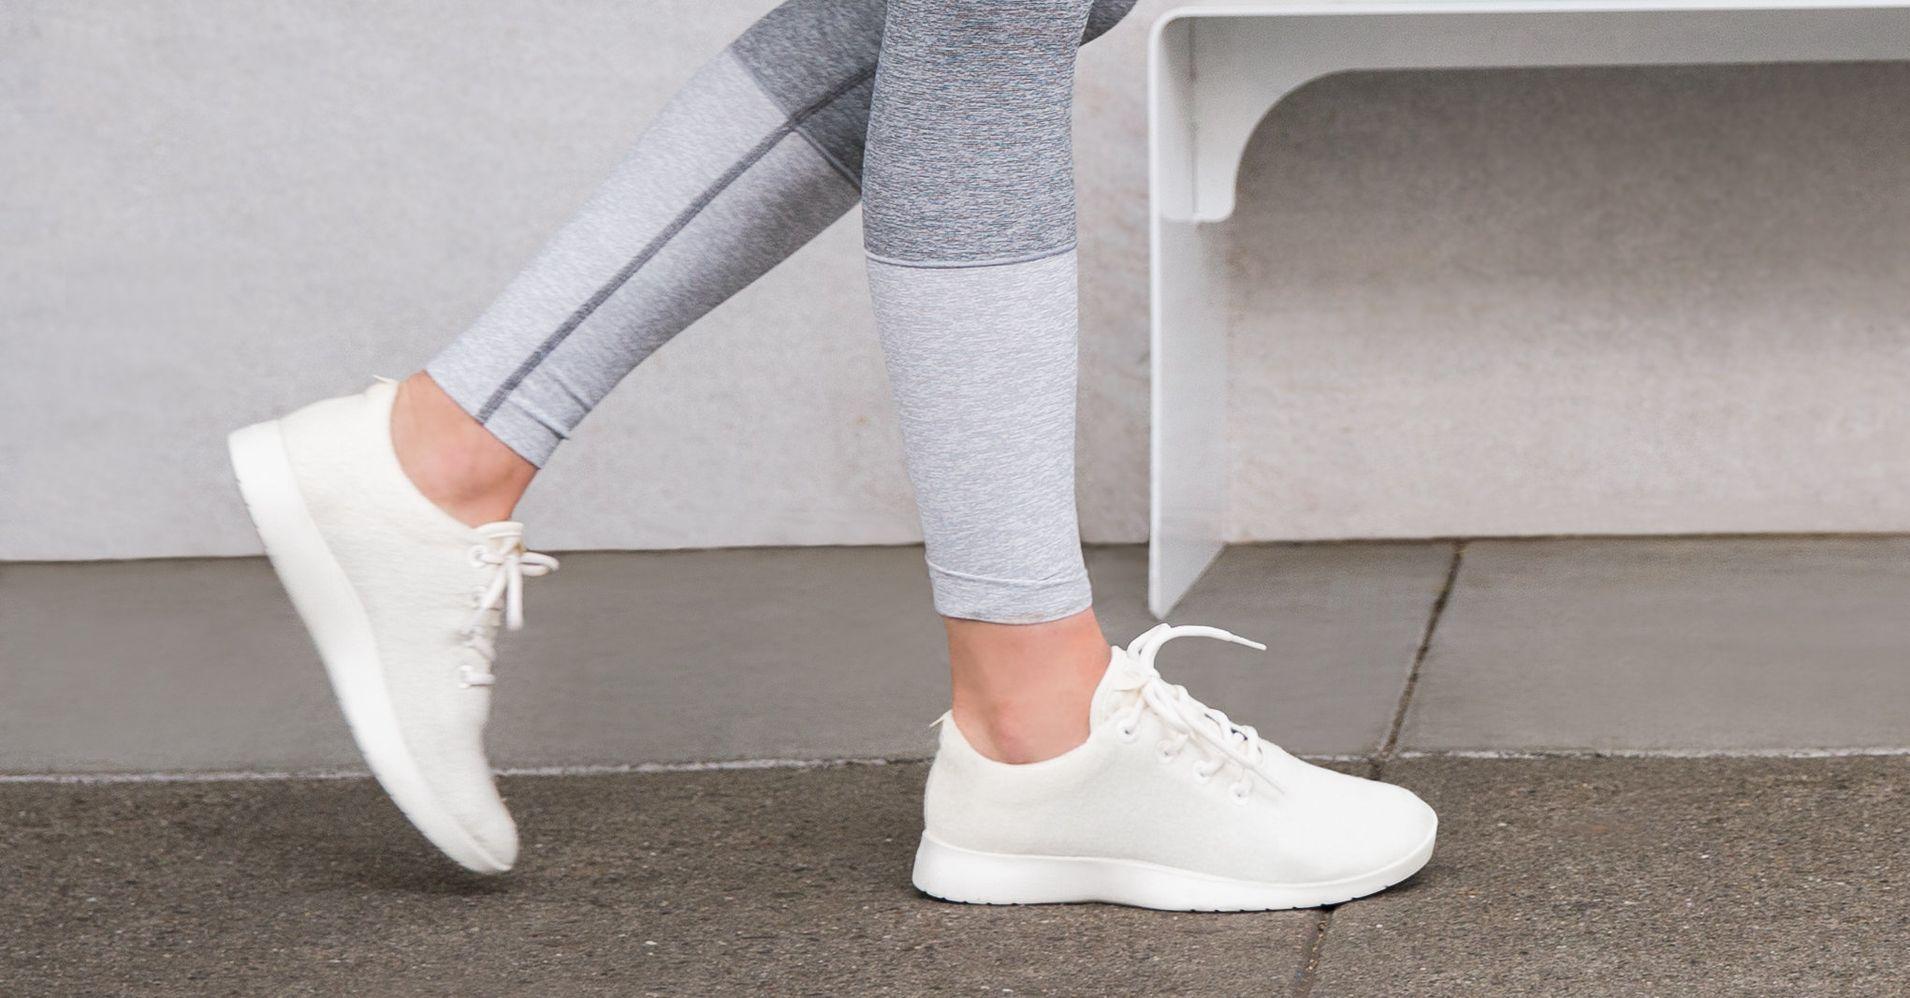 Kicking The White Shoes